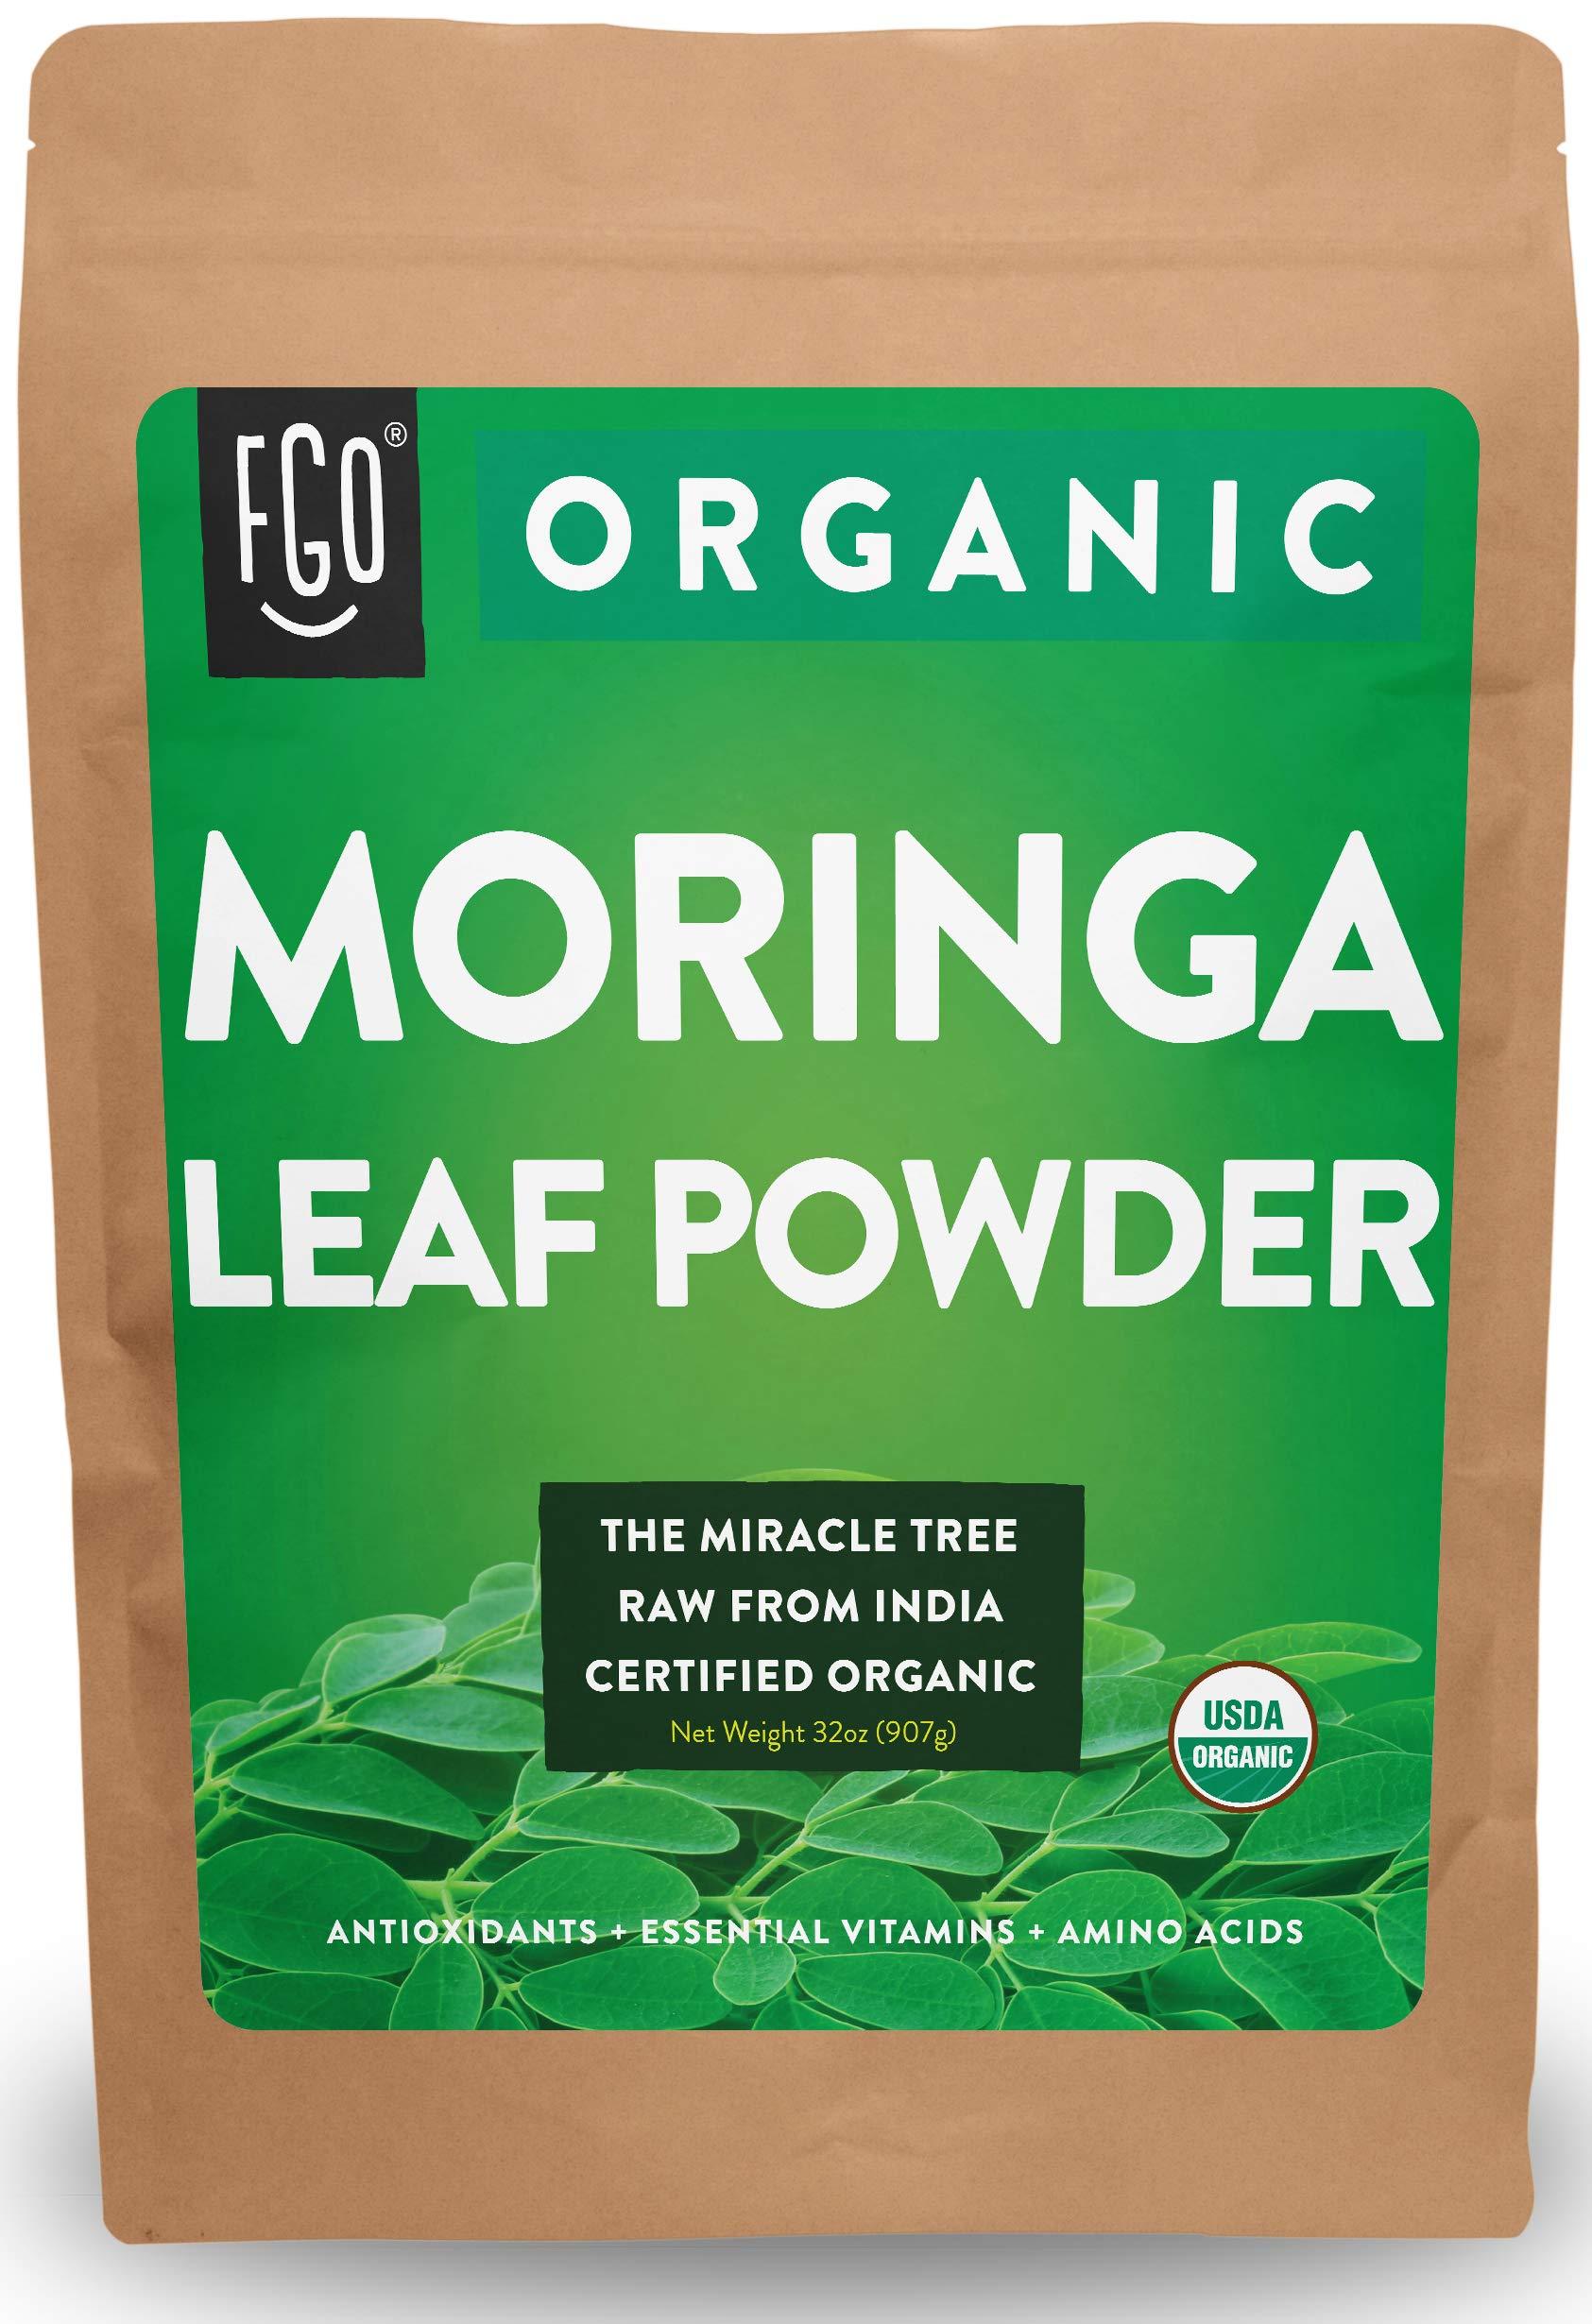 Organic Moringa Oleifera Leaf Powder - Perfect for Smoothies, Drinks, Tea & Recipes - 100% Raw From India - 32oz/907g Resealable Bag - by Feel Good Organics by Feel Good Organics